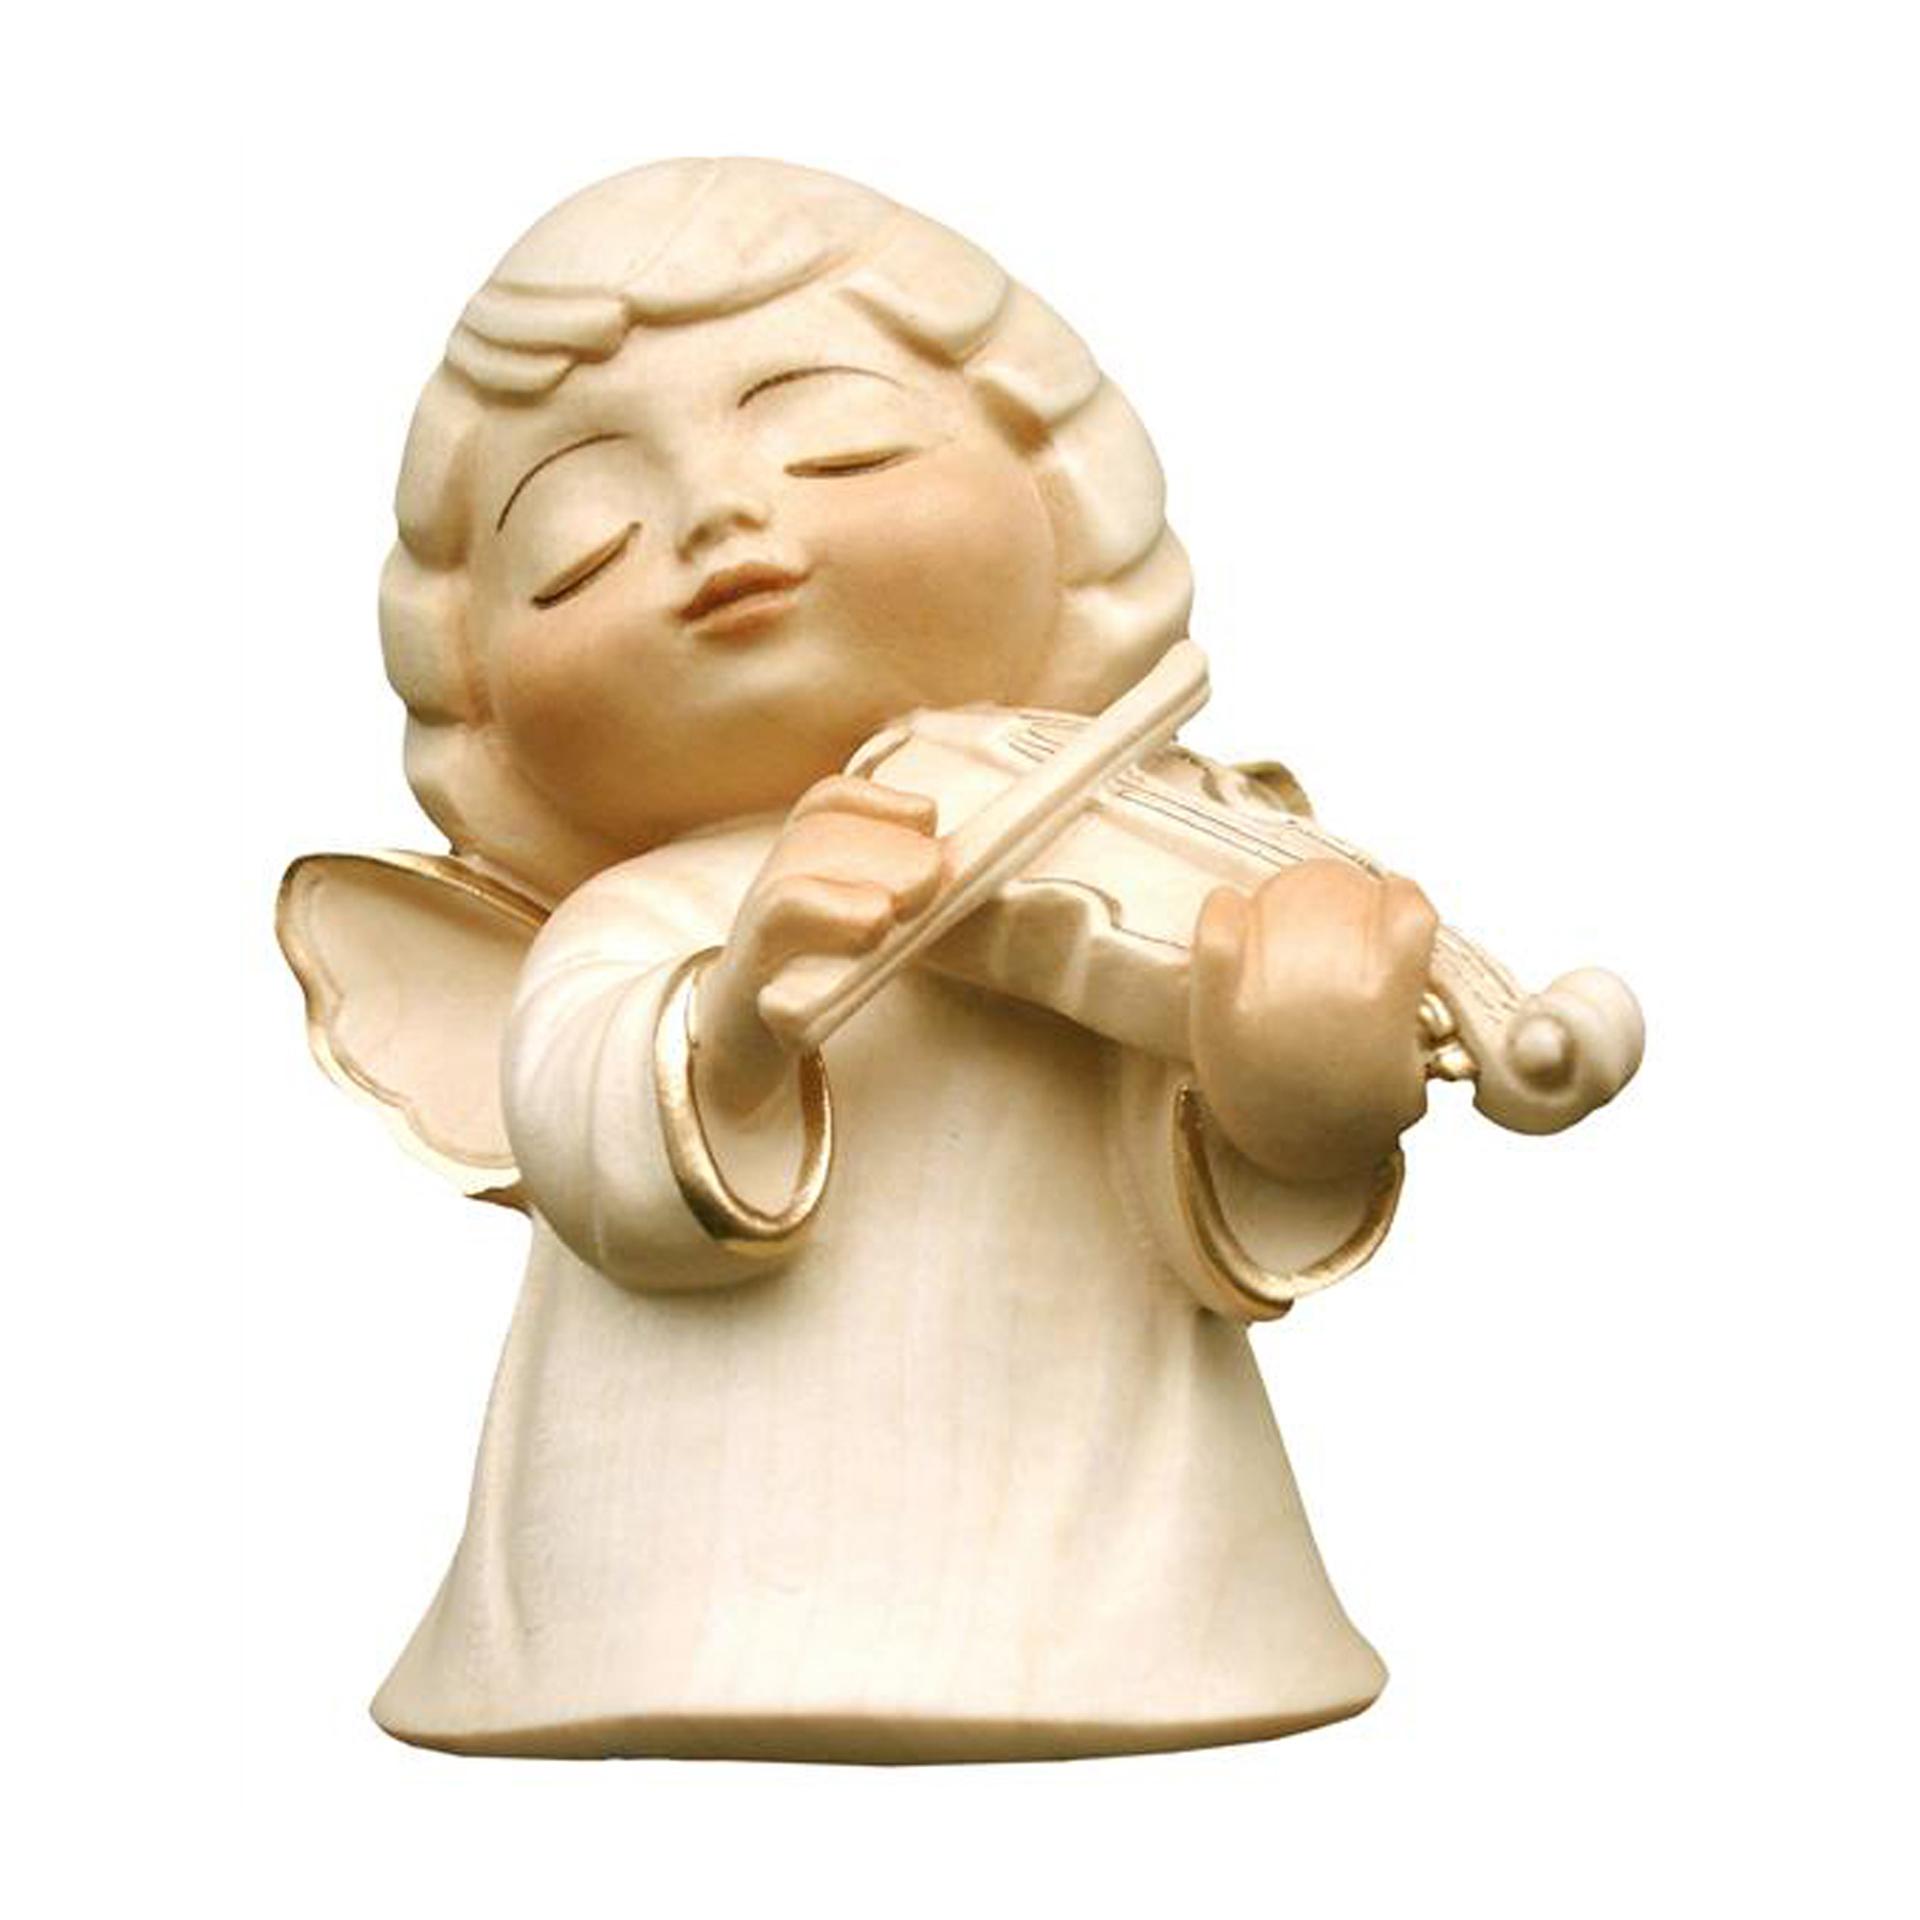 Engel mit Violine, alabaster